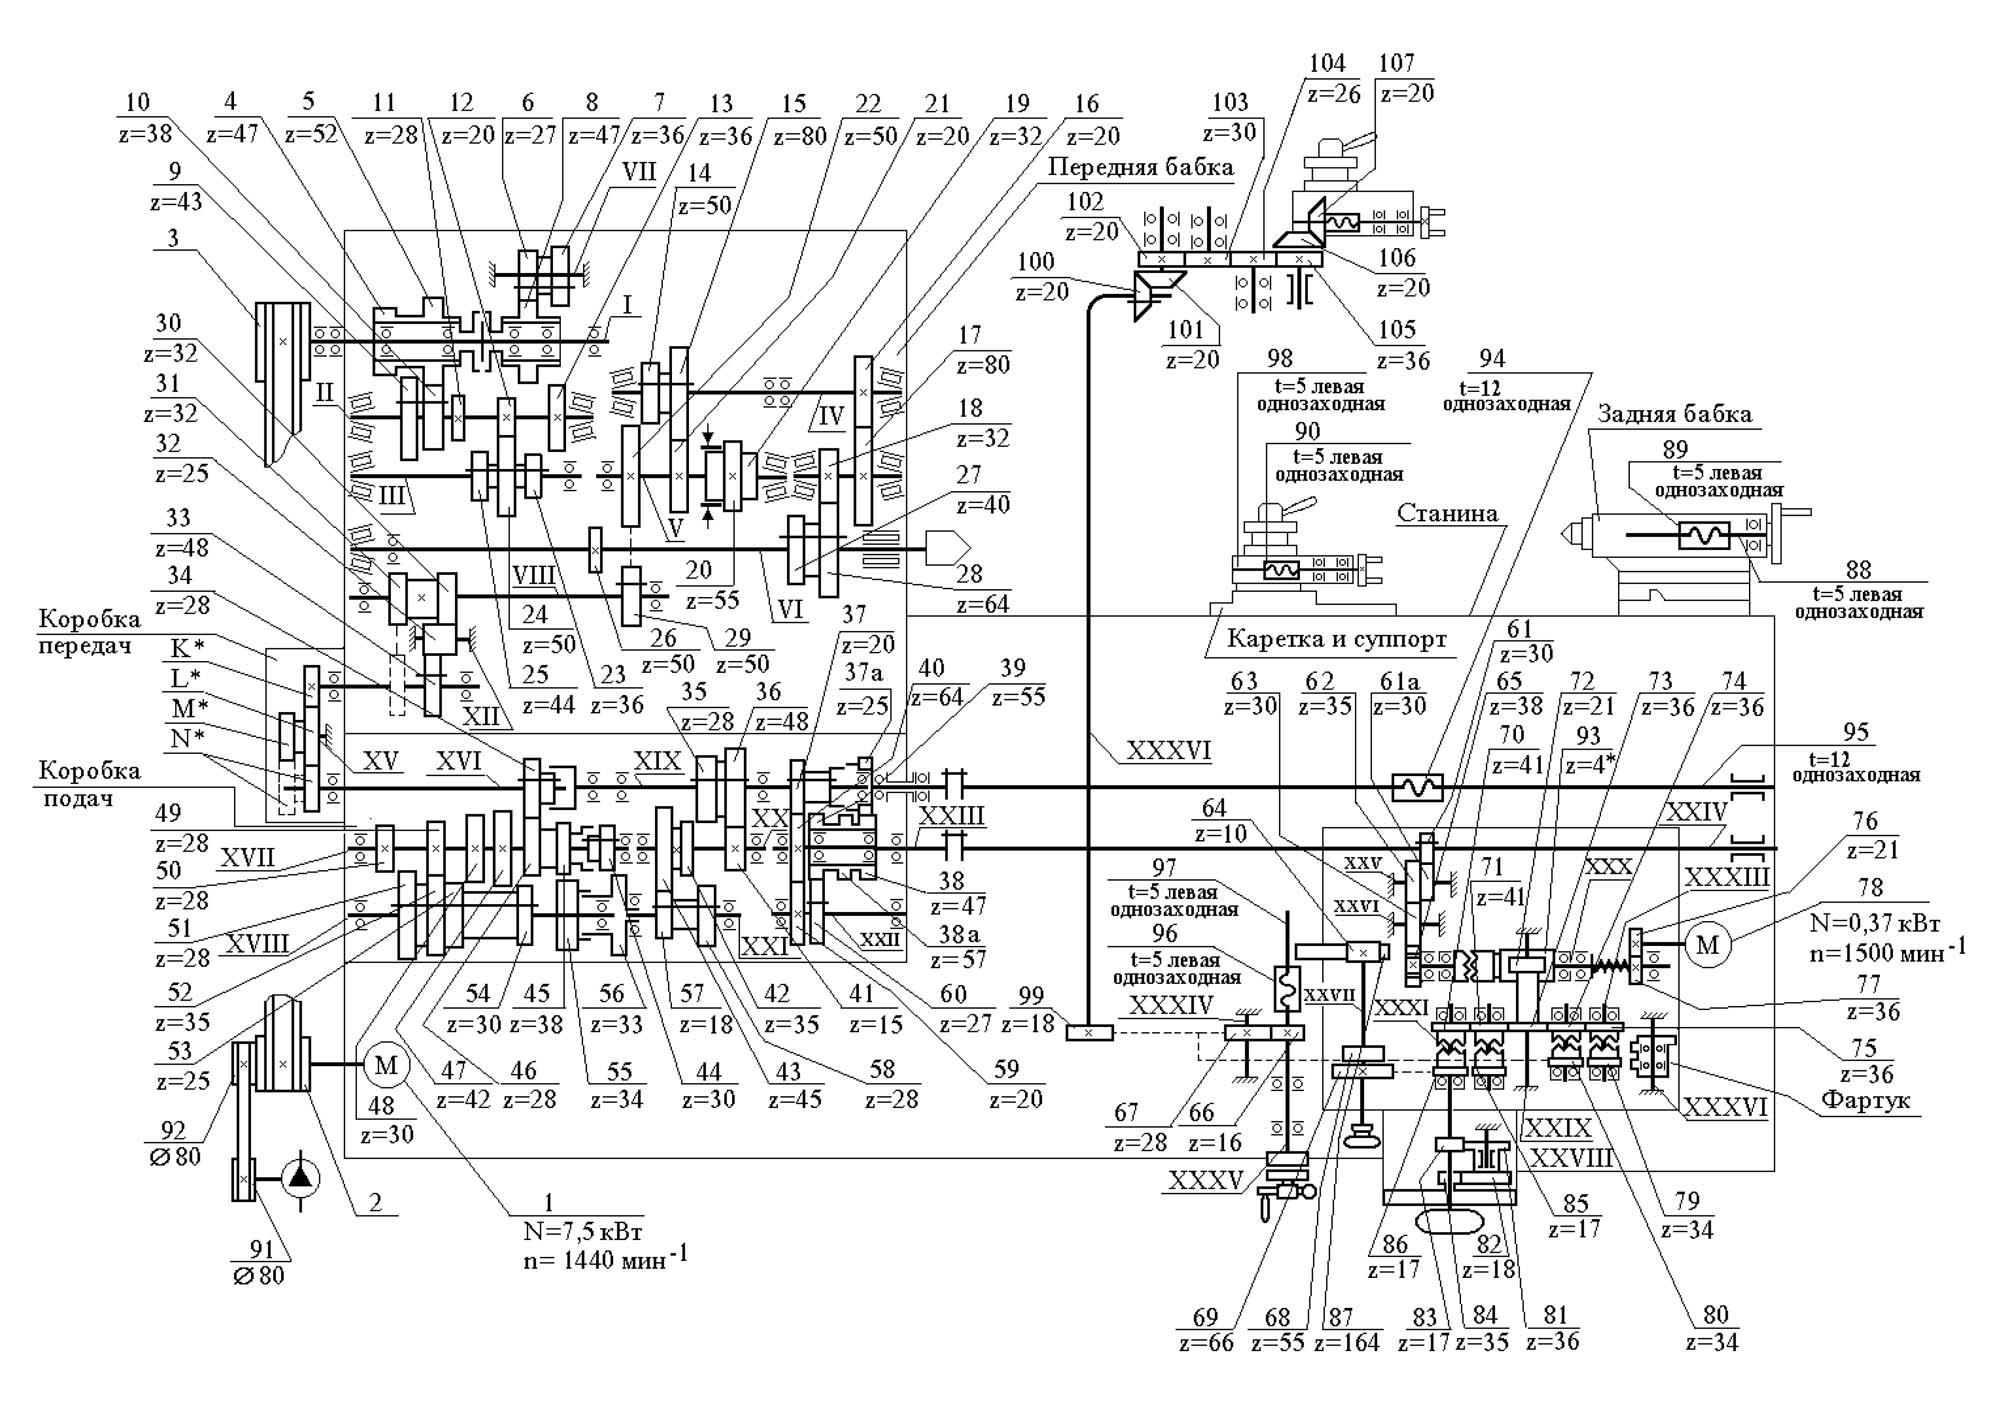 эл схема станка 16б20п.061